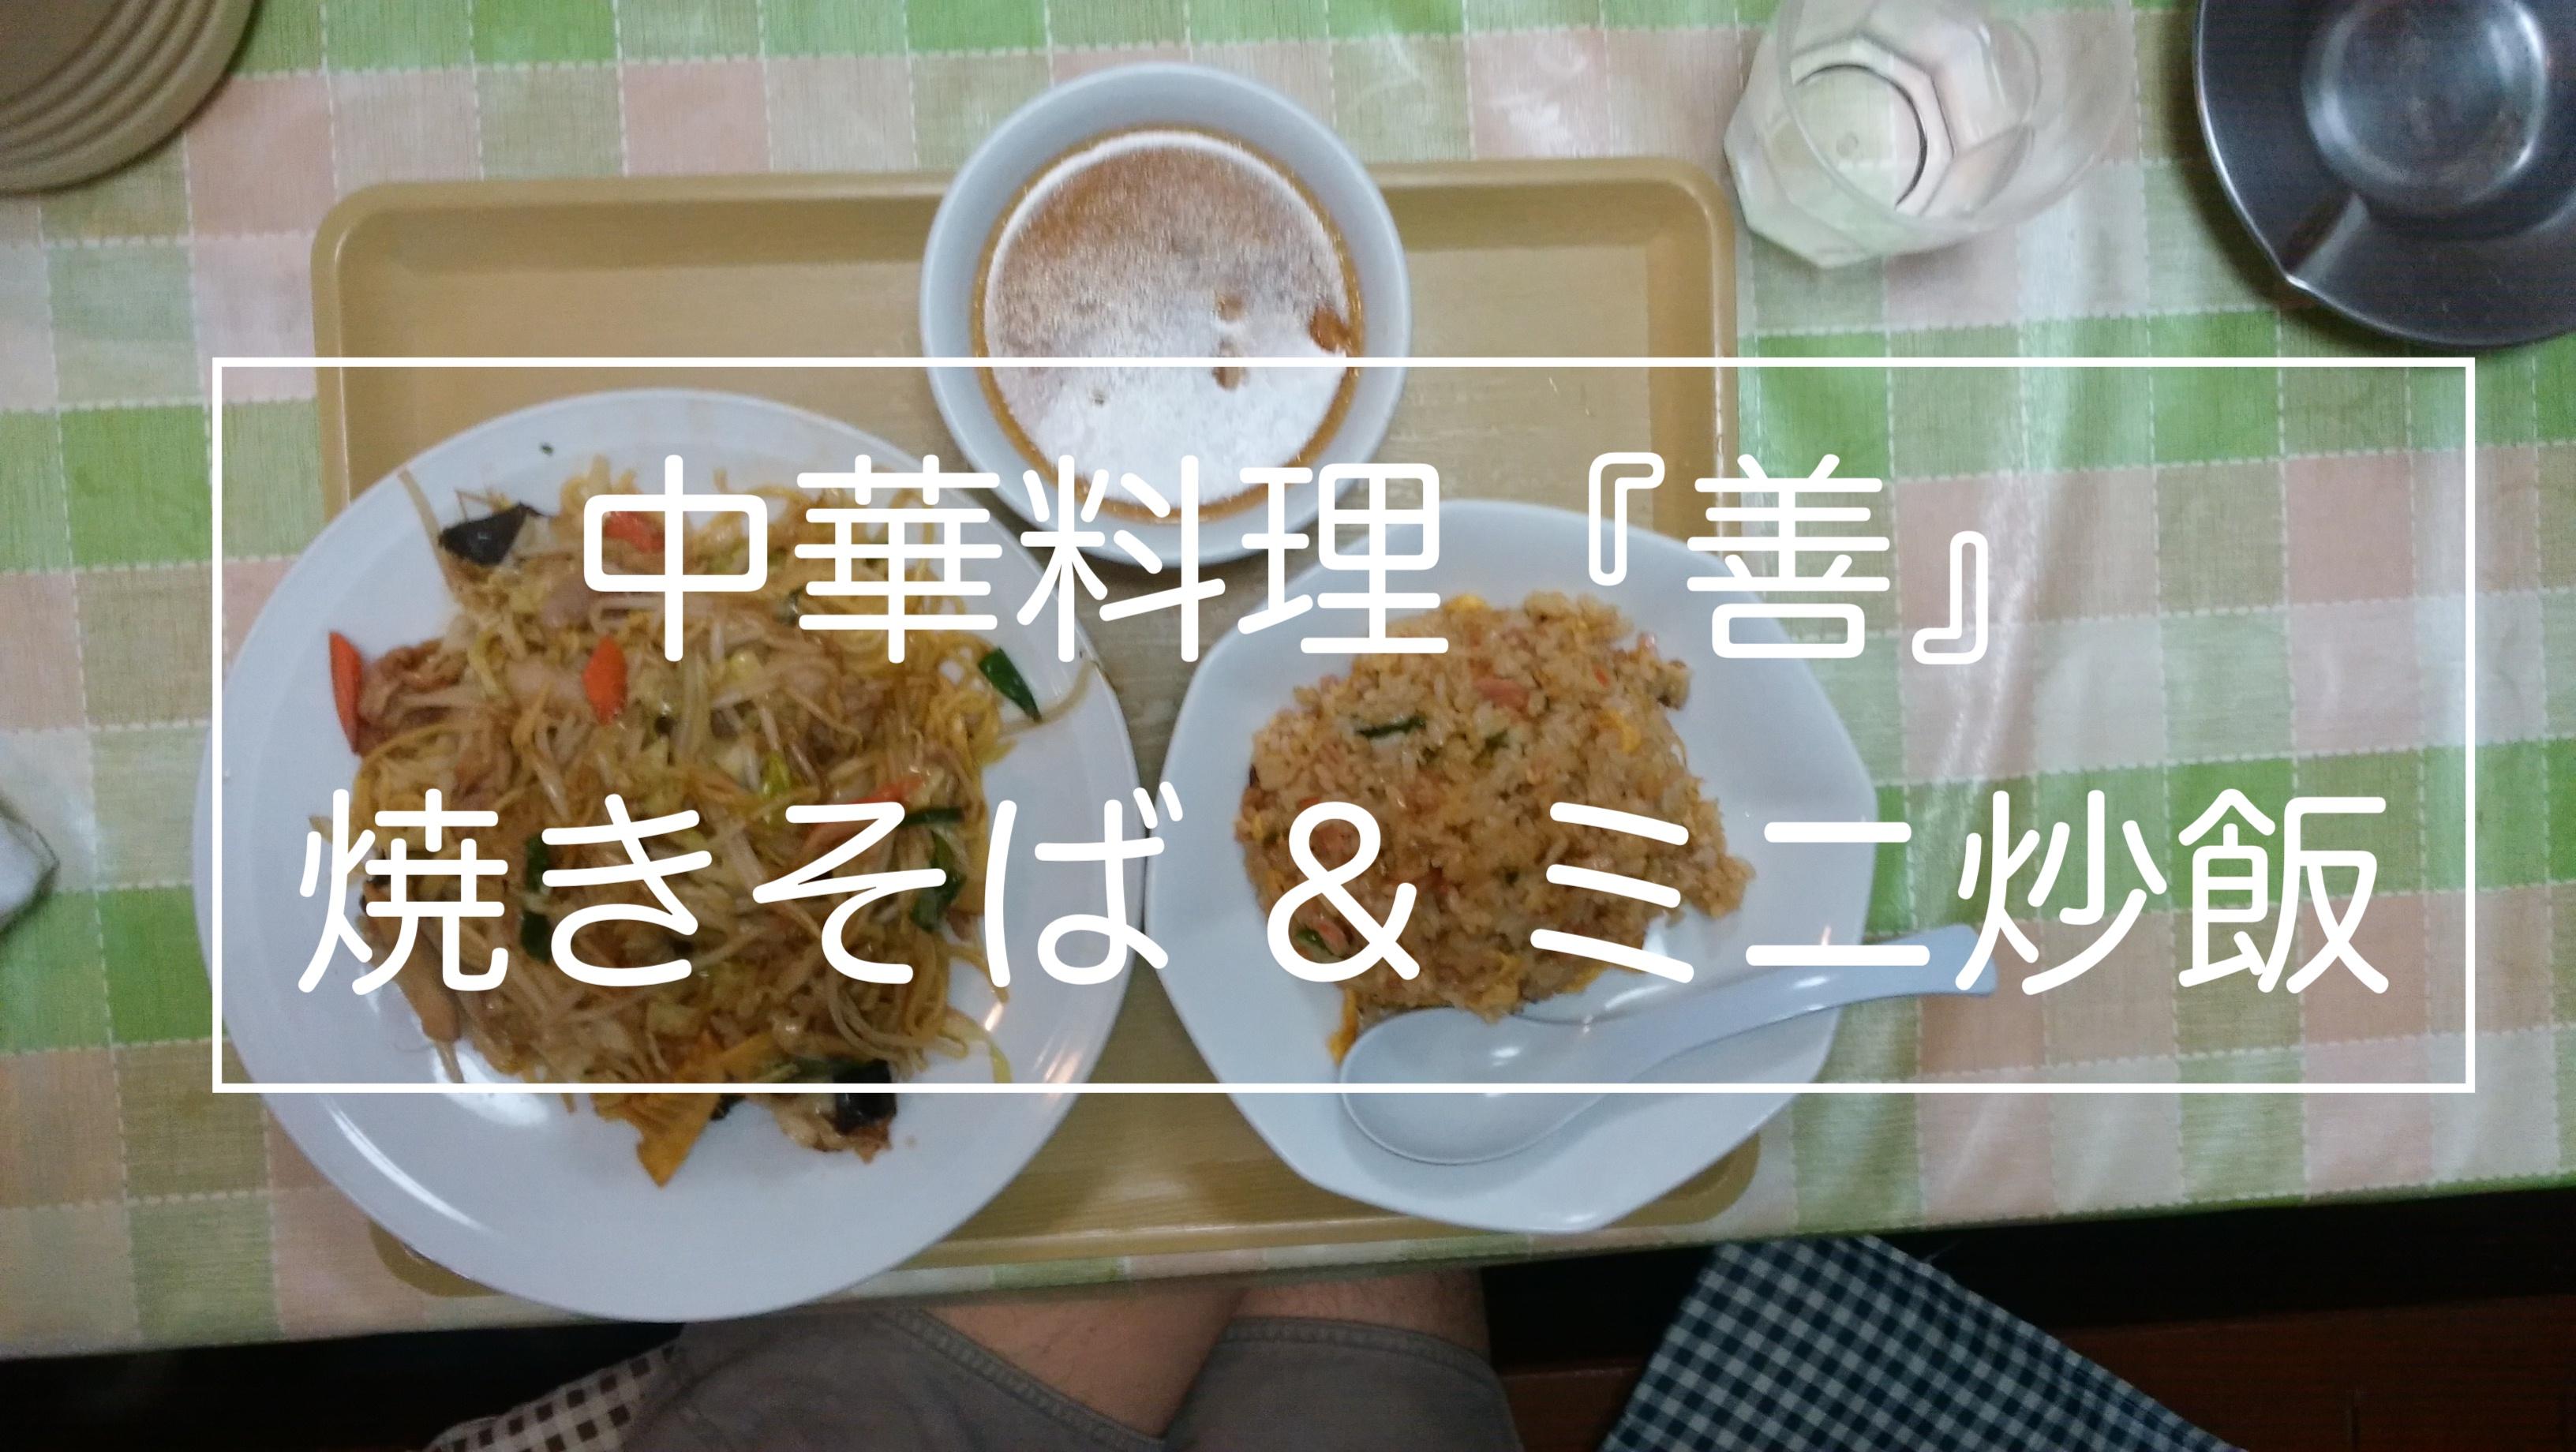 野江の中華料理「善」